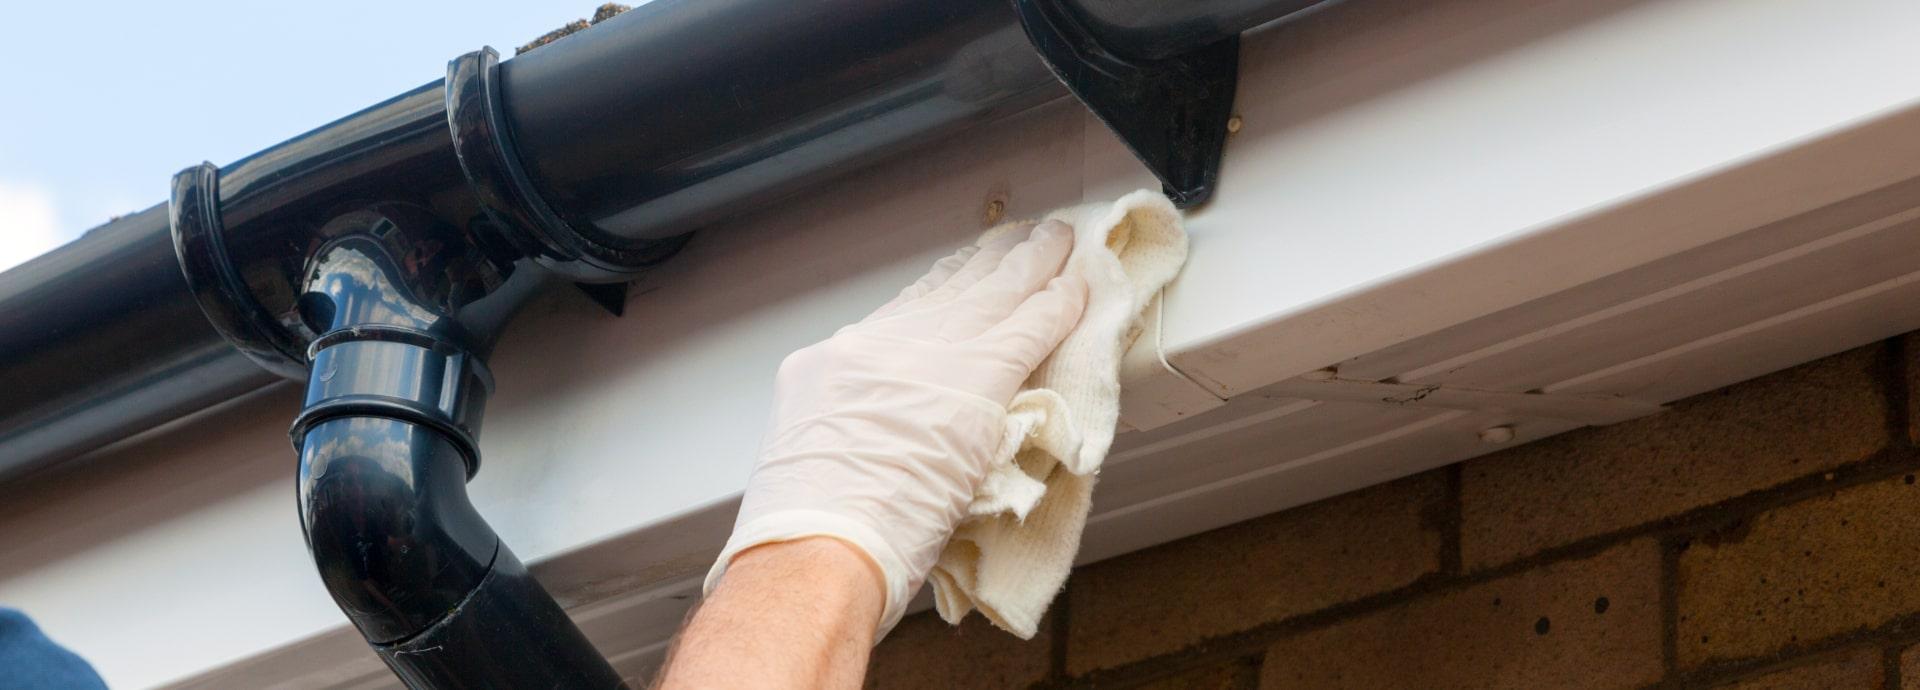 SPL Property Management - Maintenance